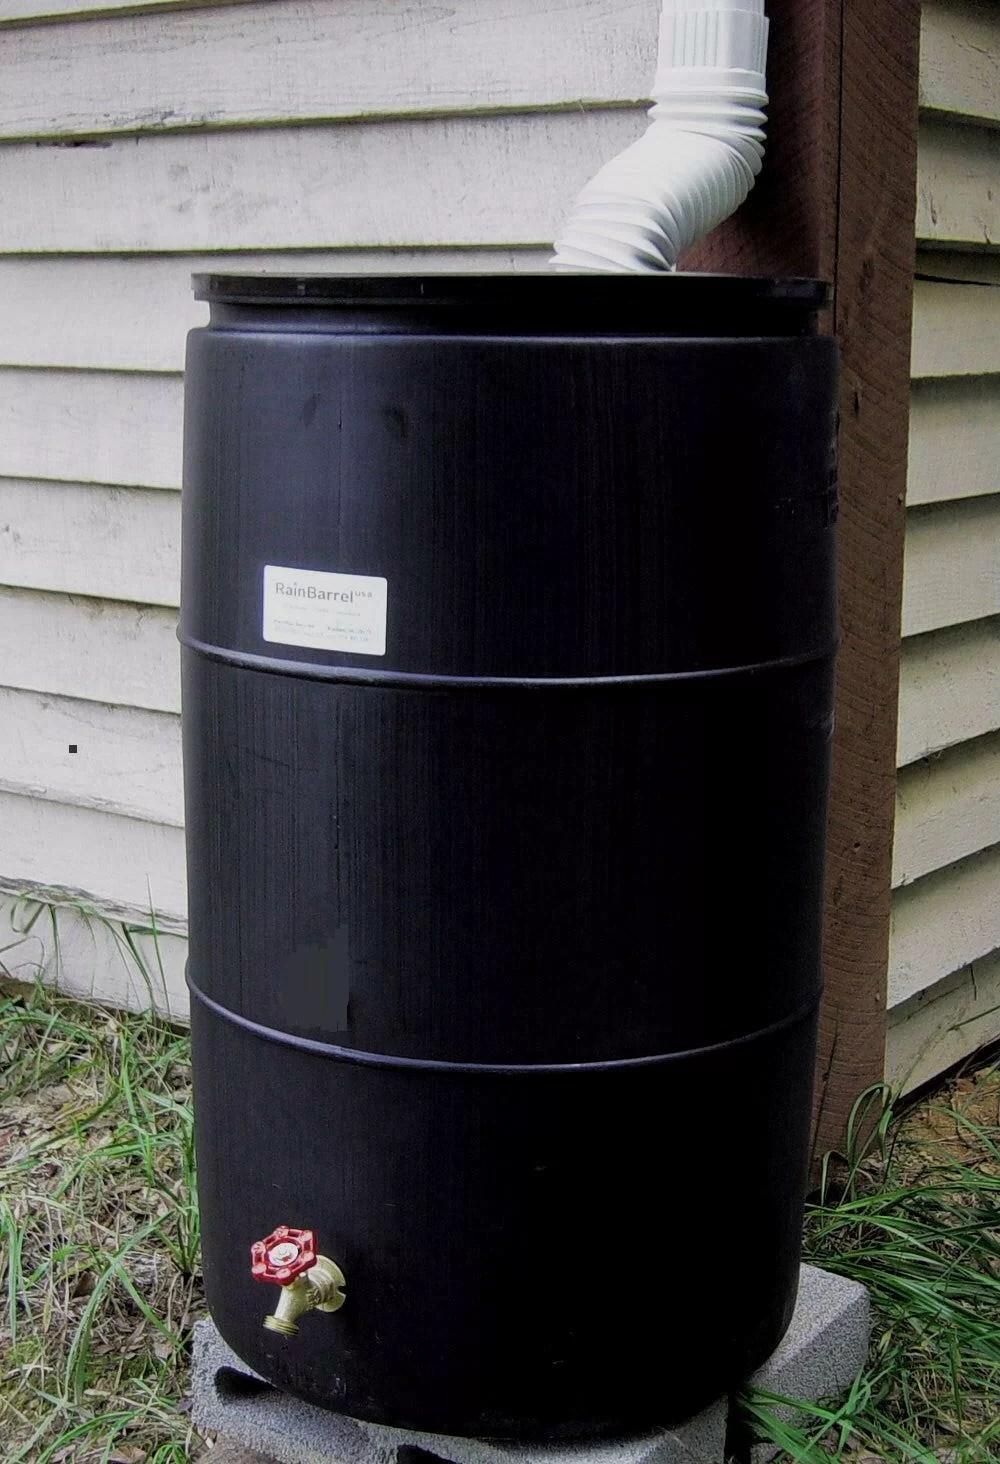 55 gallon rain barrel